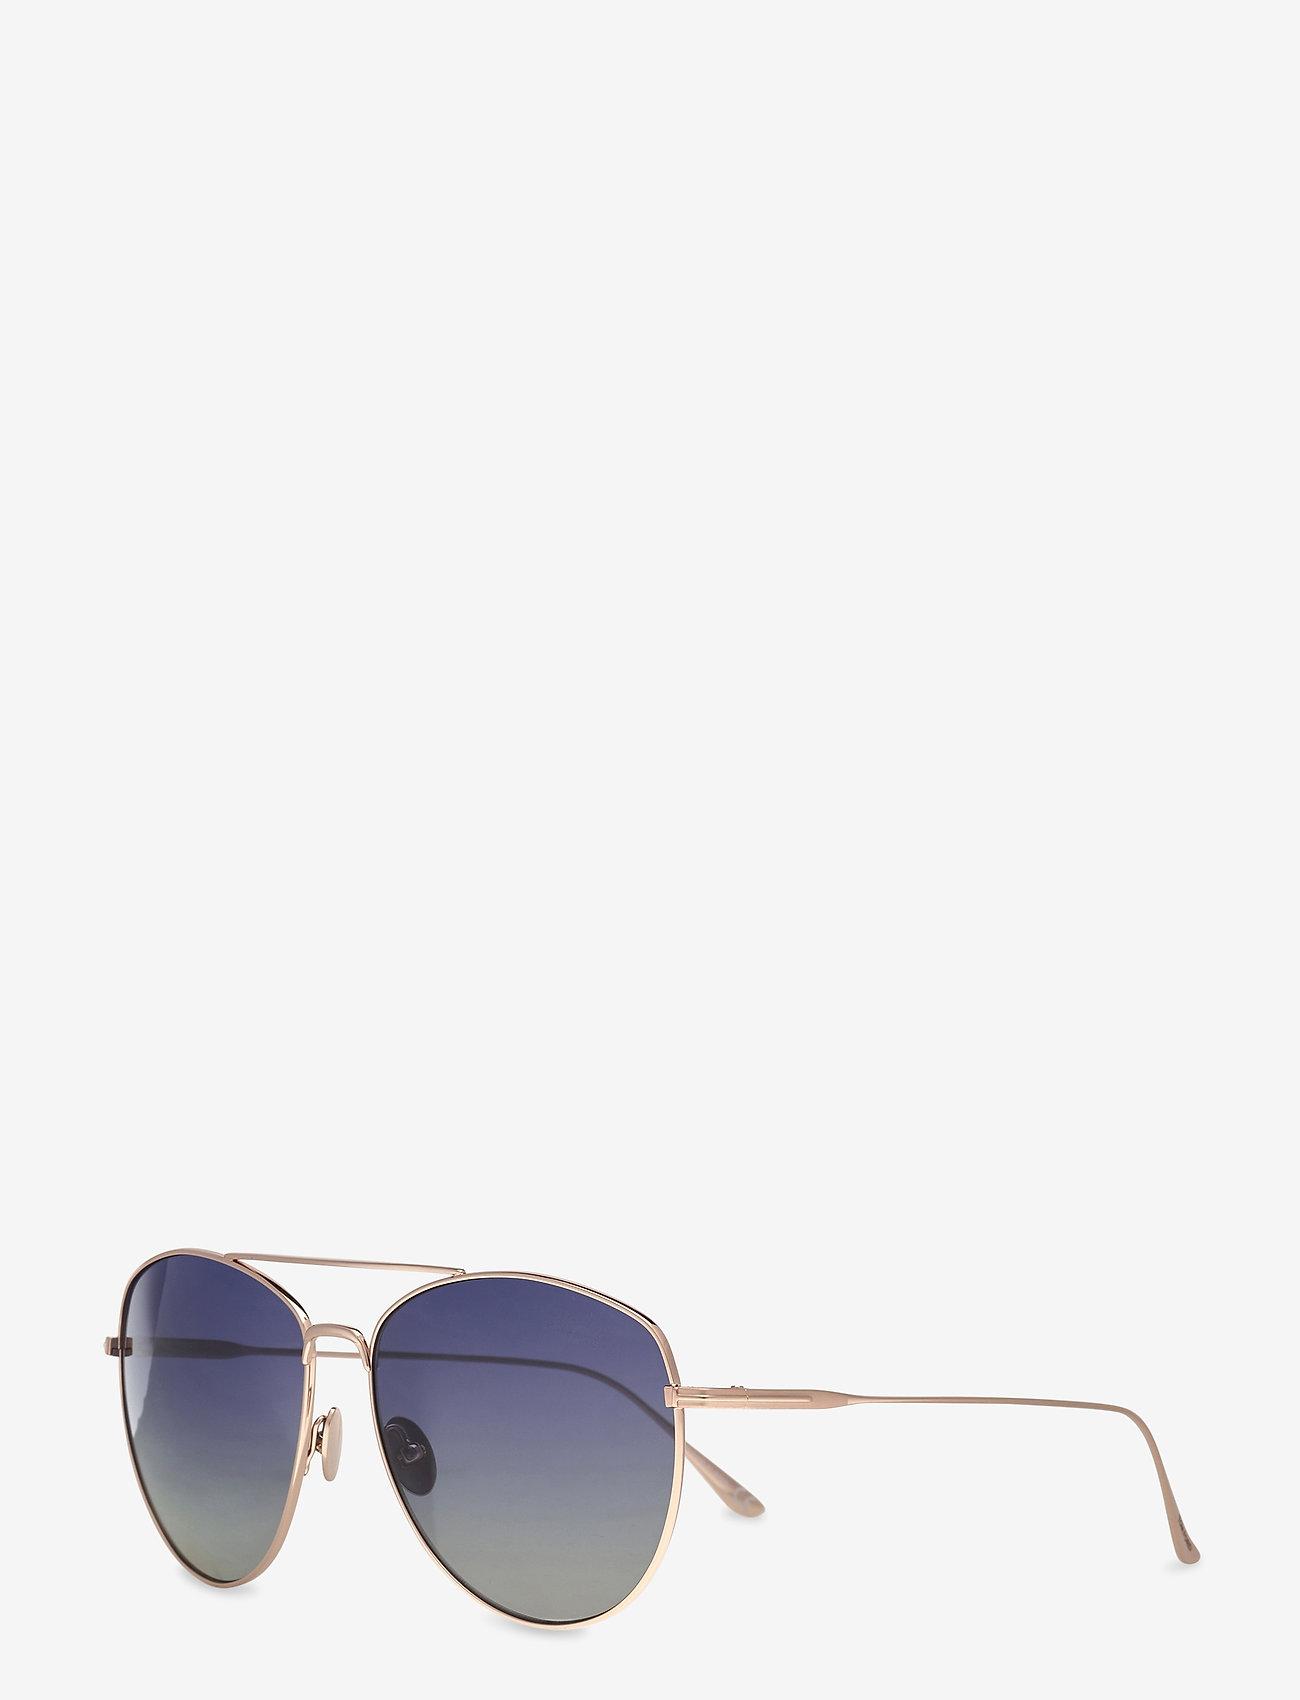 Tom Ford Sunglasses - Tom Ford MILLA - rond model - shiny rose gold - 1